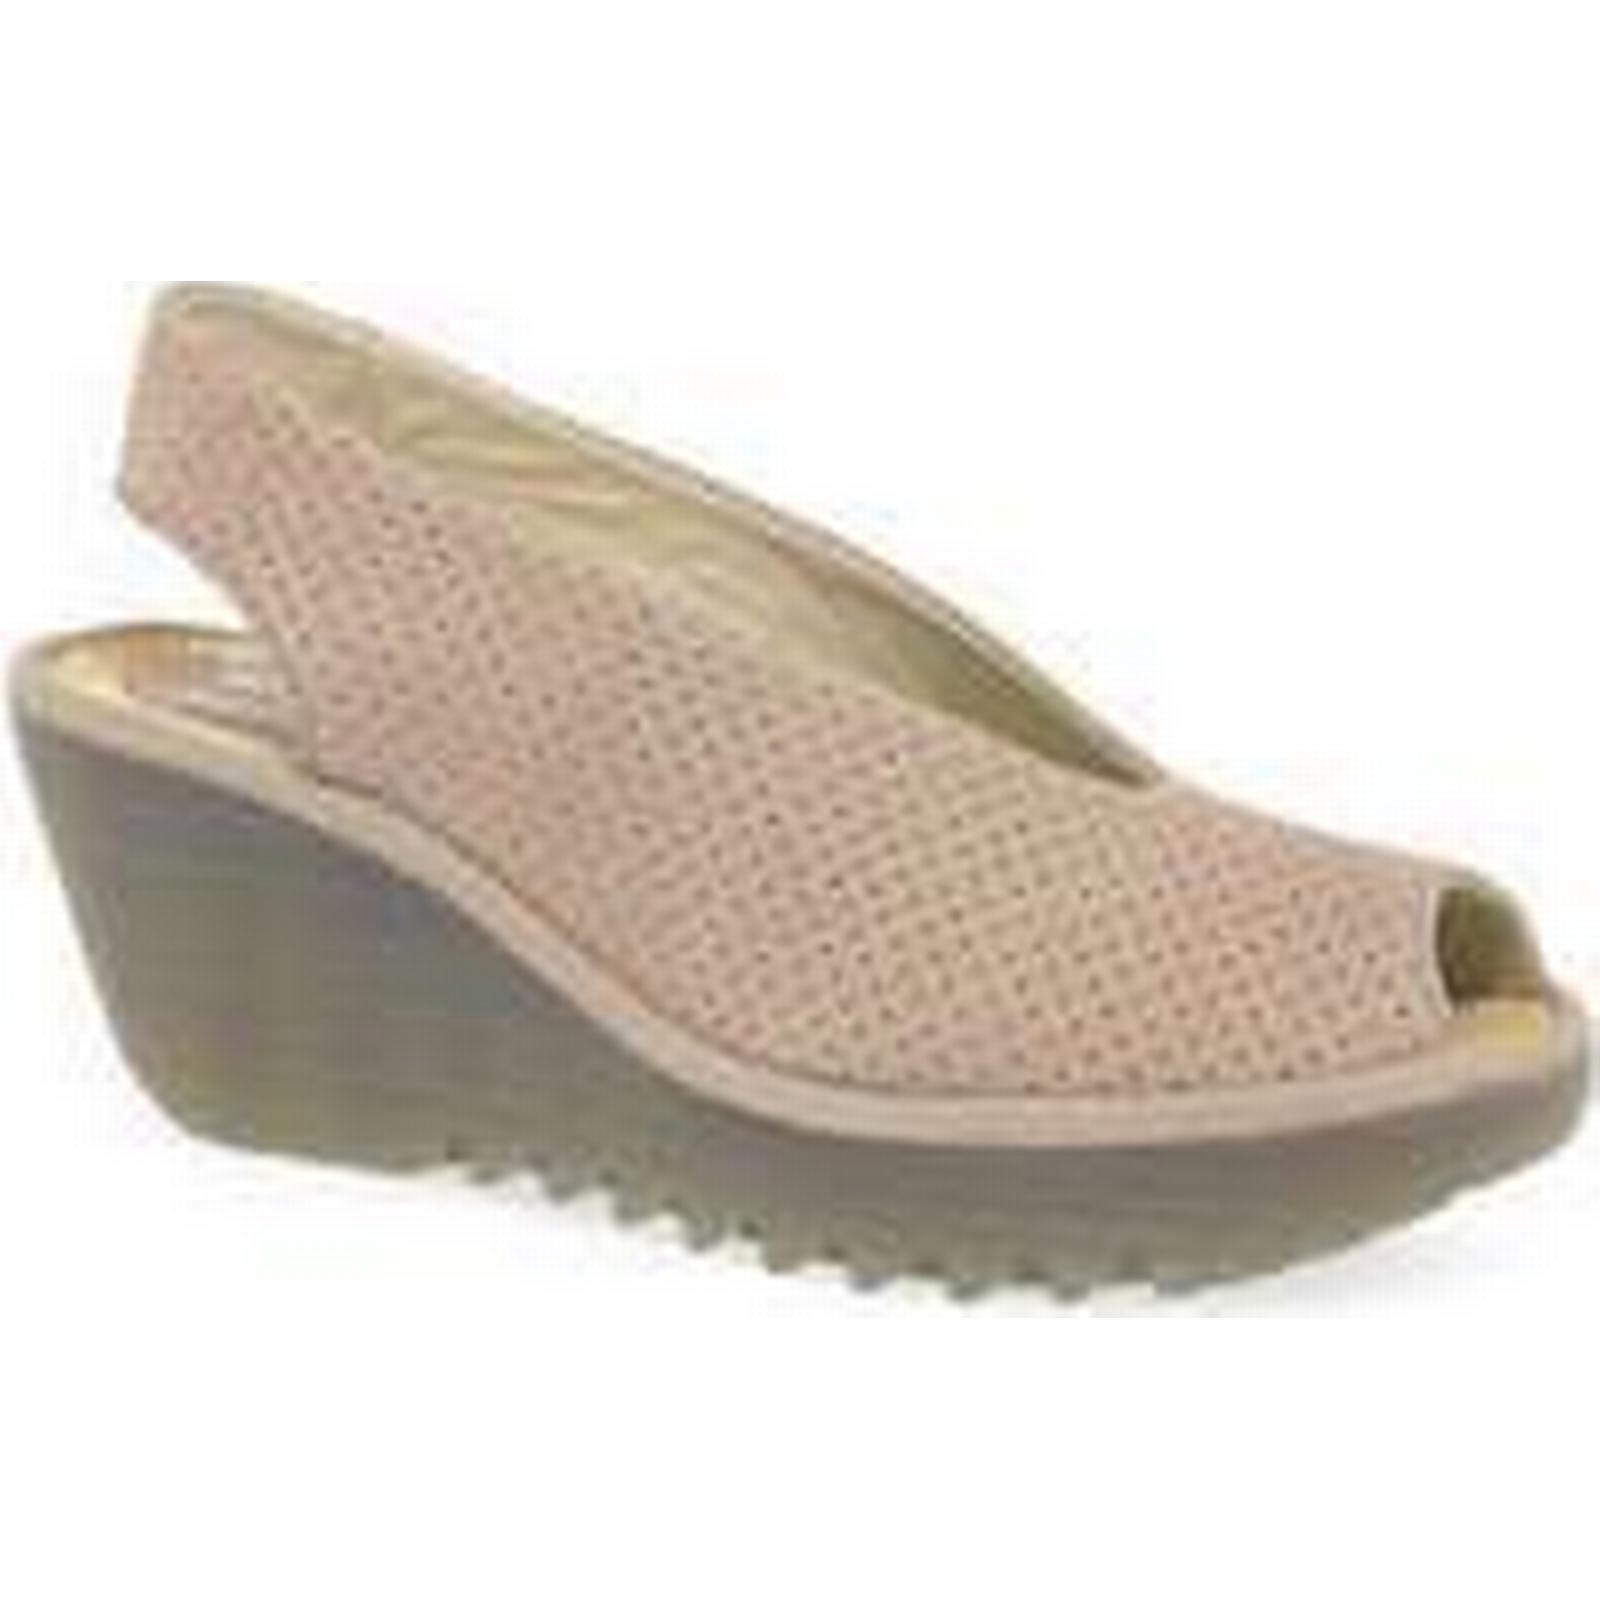 spartoo.co.uk spartoo.co.uk spartoo.co.uk fly london yazu  s wedge talon sandales femmes & #  ; s les sandales en rose 8c391d